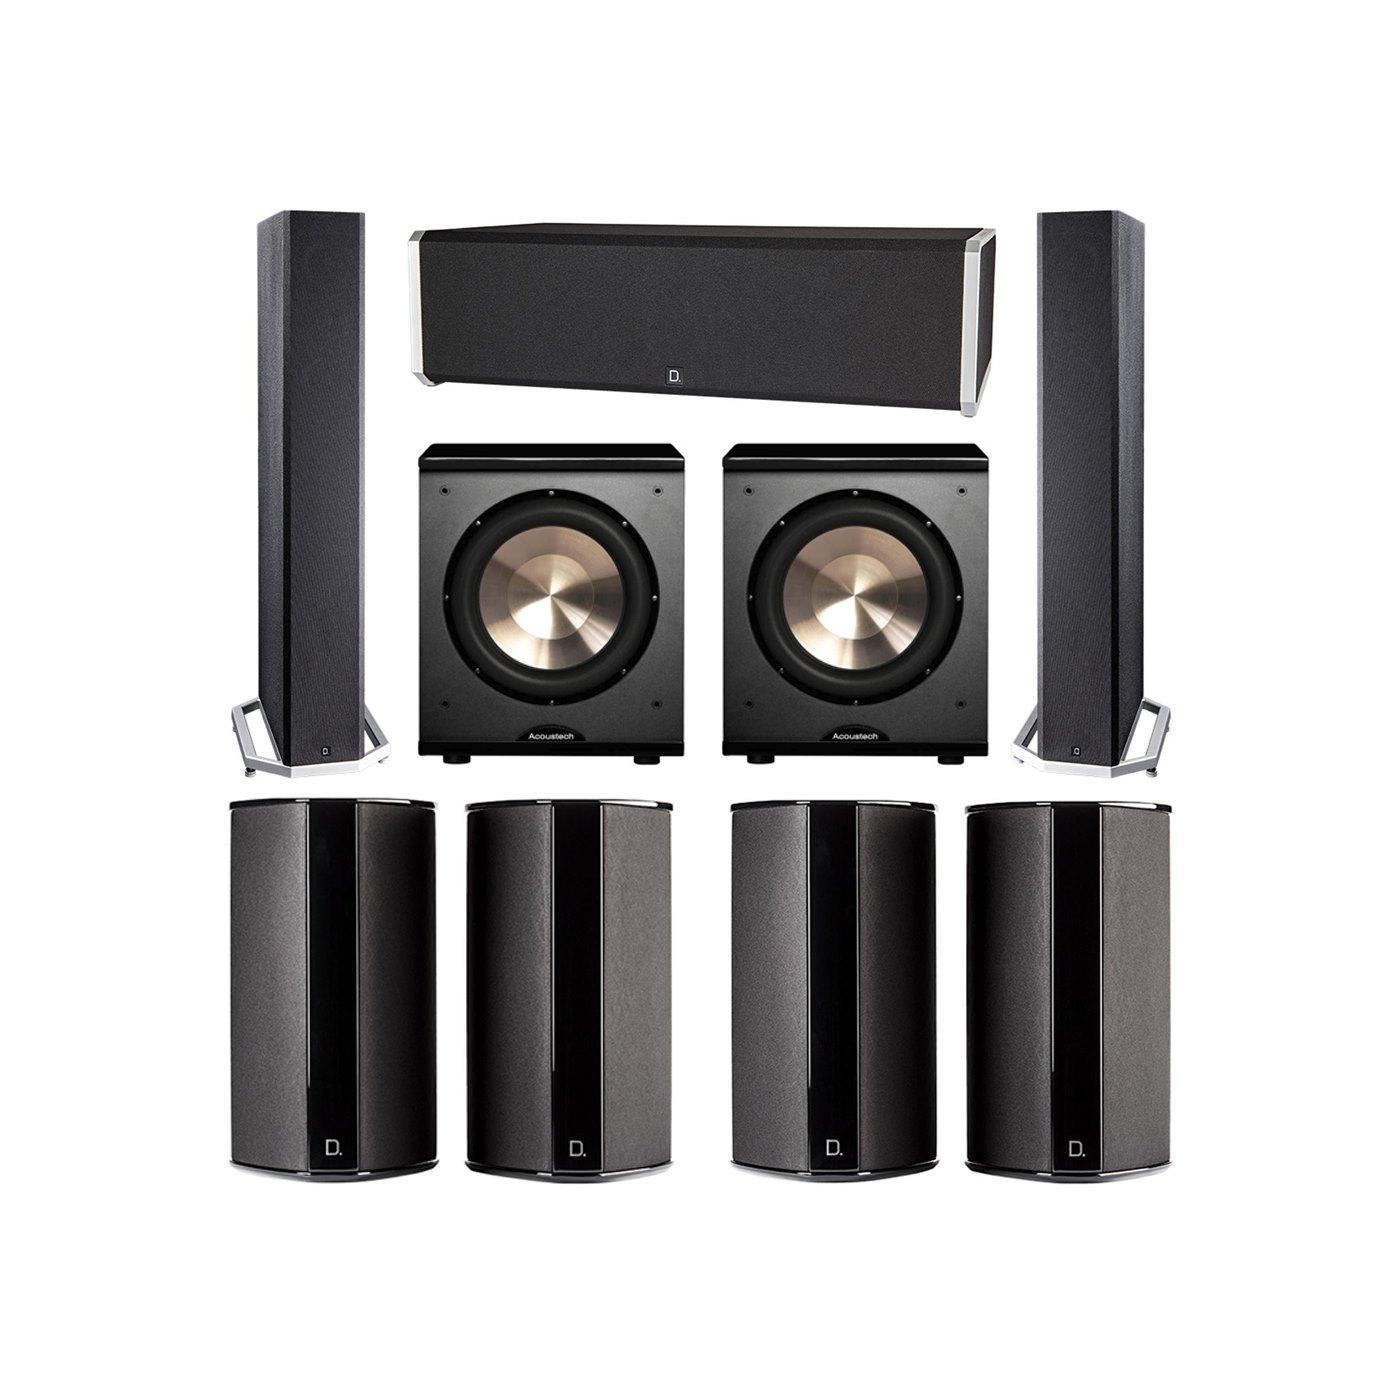 Definitive Technology 7.2 System with 2 BP9040 Tower Speakers, 1 CS9040 Center Channel Speaker, 4 SR9080 Surround Speaker, 2 BIC PL-200 Subwoofer